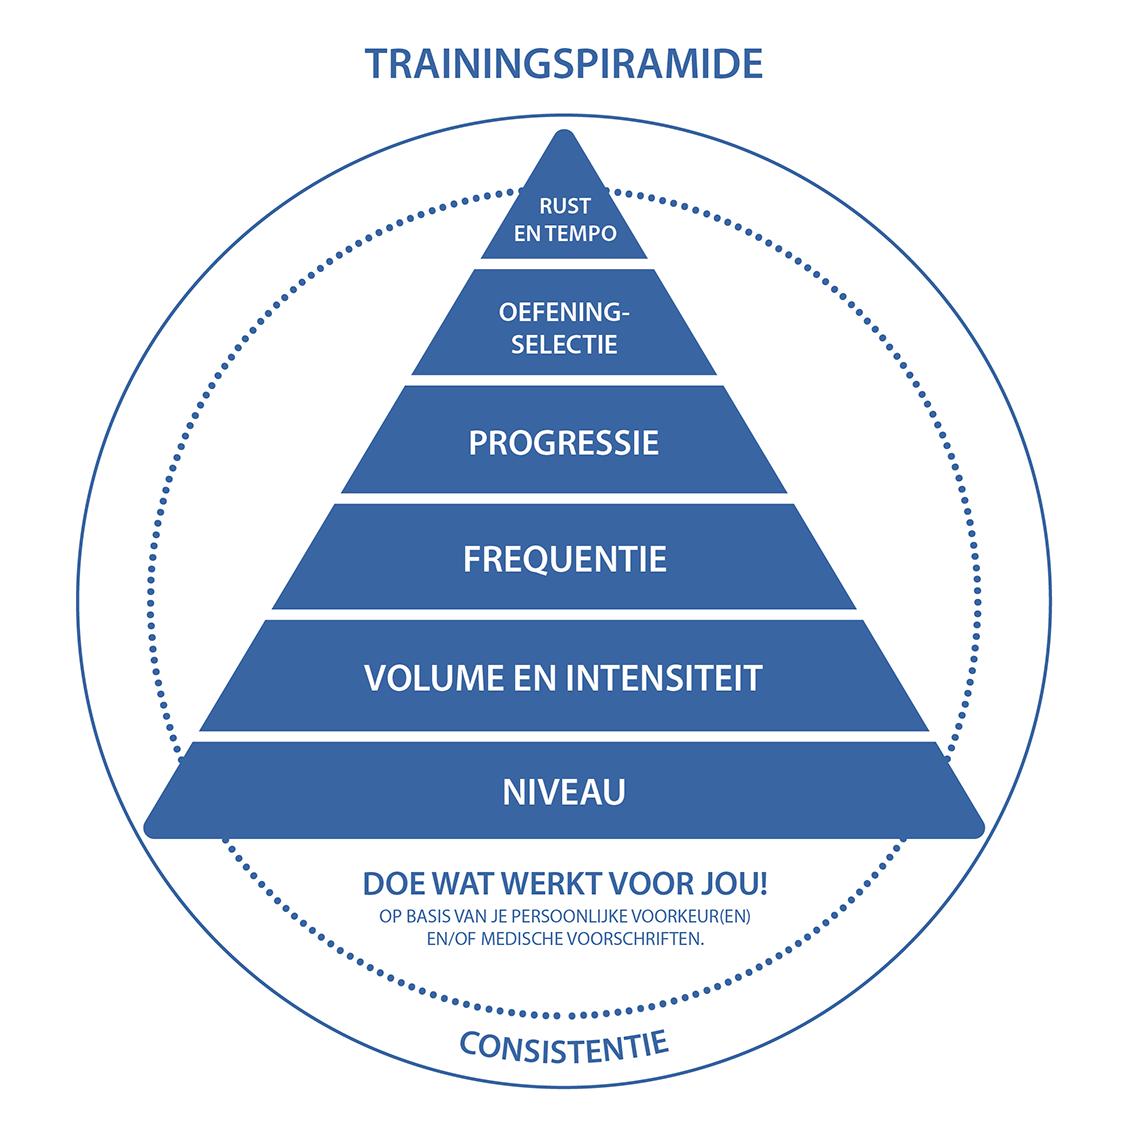 Trainingspiramide